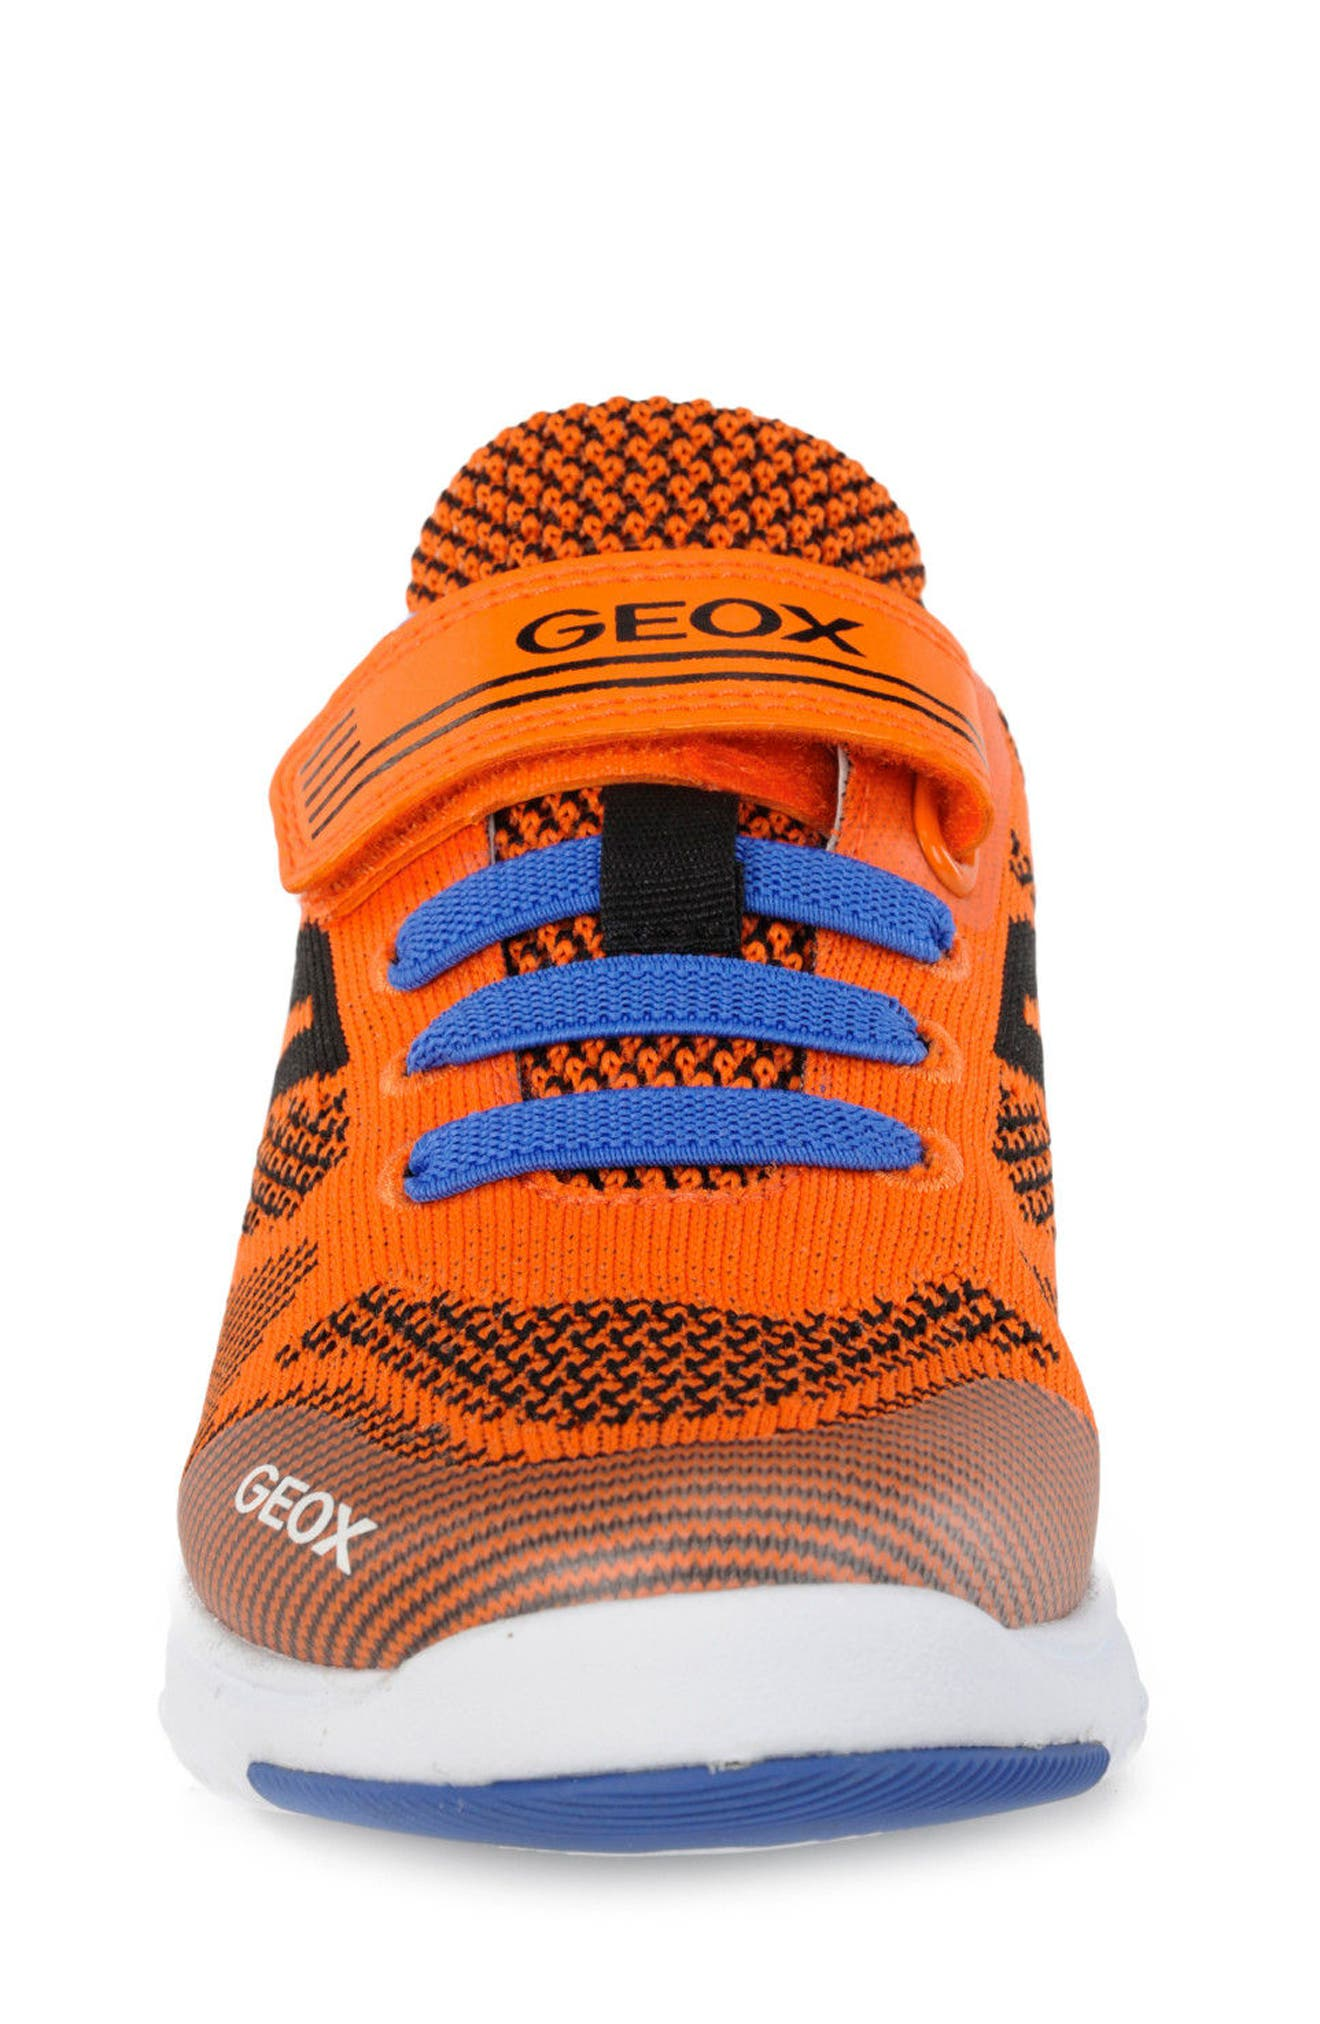 Xunday Low Top Woven Sneaker,                             Alternate thumbnail 4, color,                             Orange/ Royal